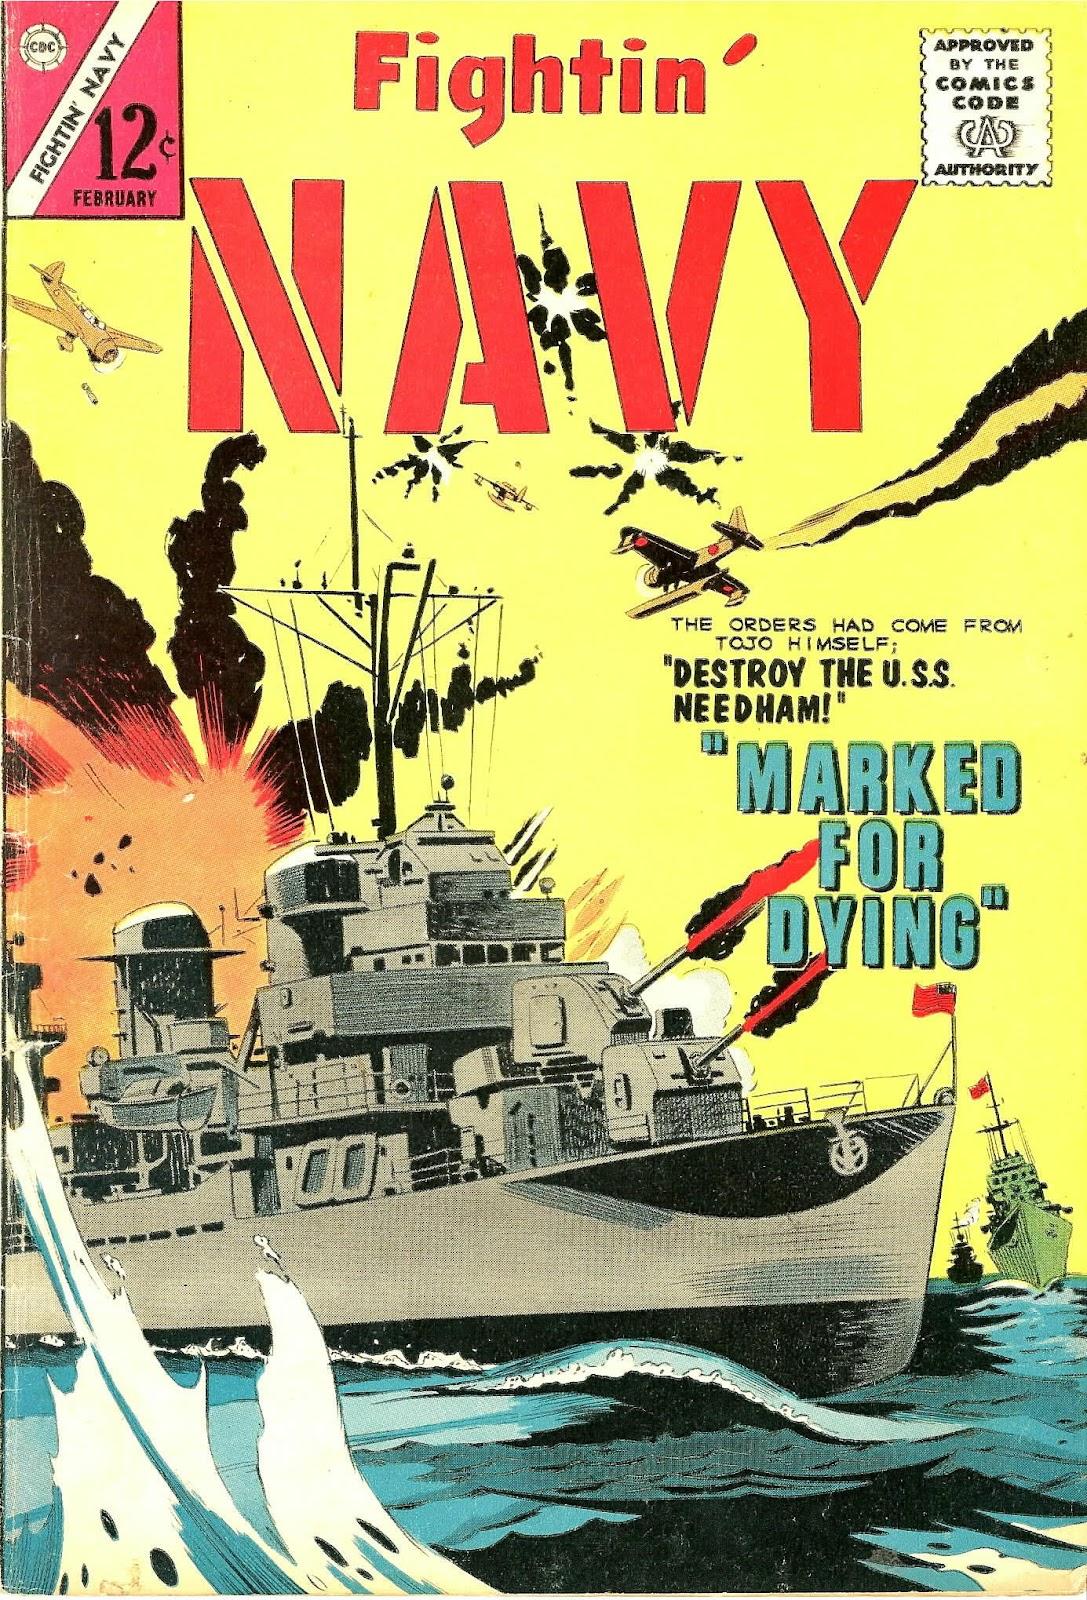 Read online Fightin' Navy comic -  Issue #114 - 1